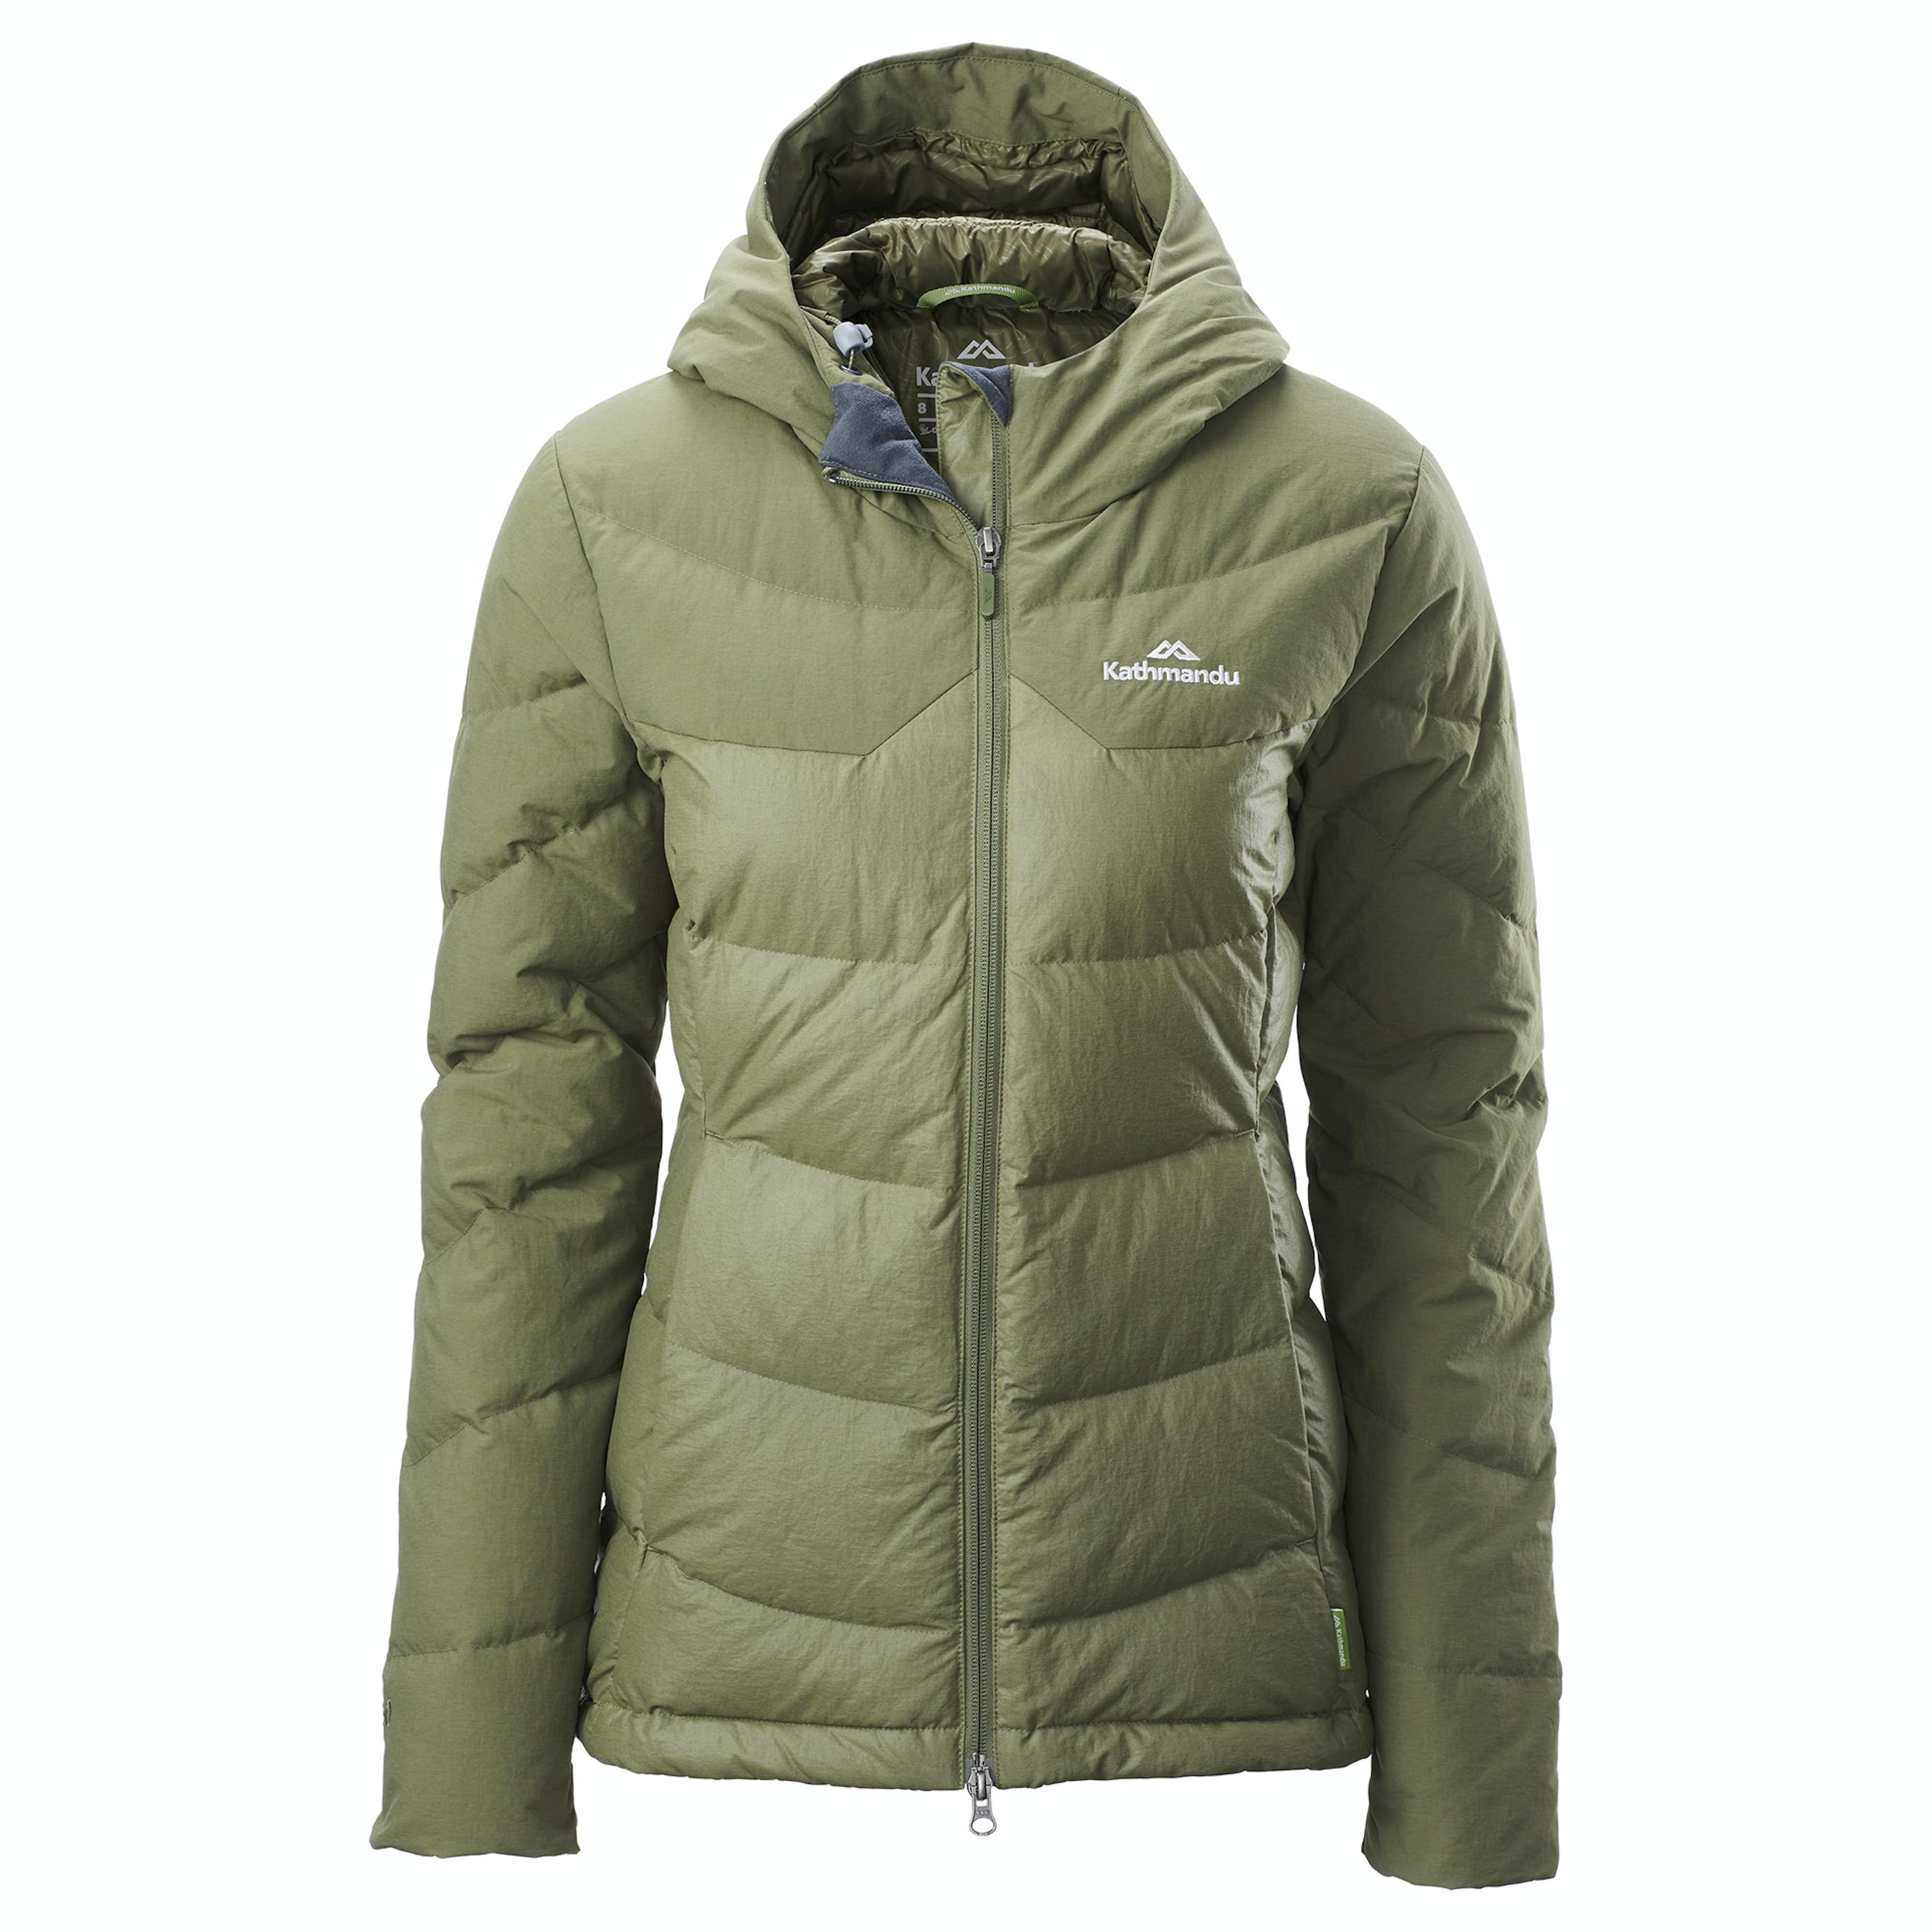 c9988d5bb Epiq Women's Hooded Down Jacket